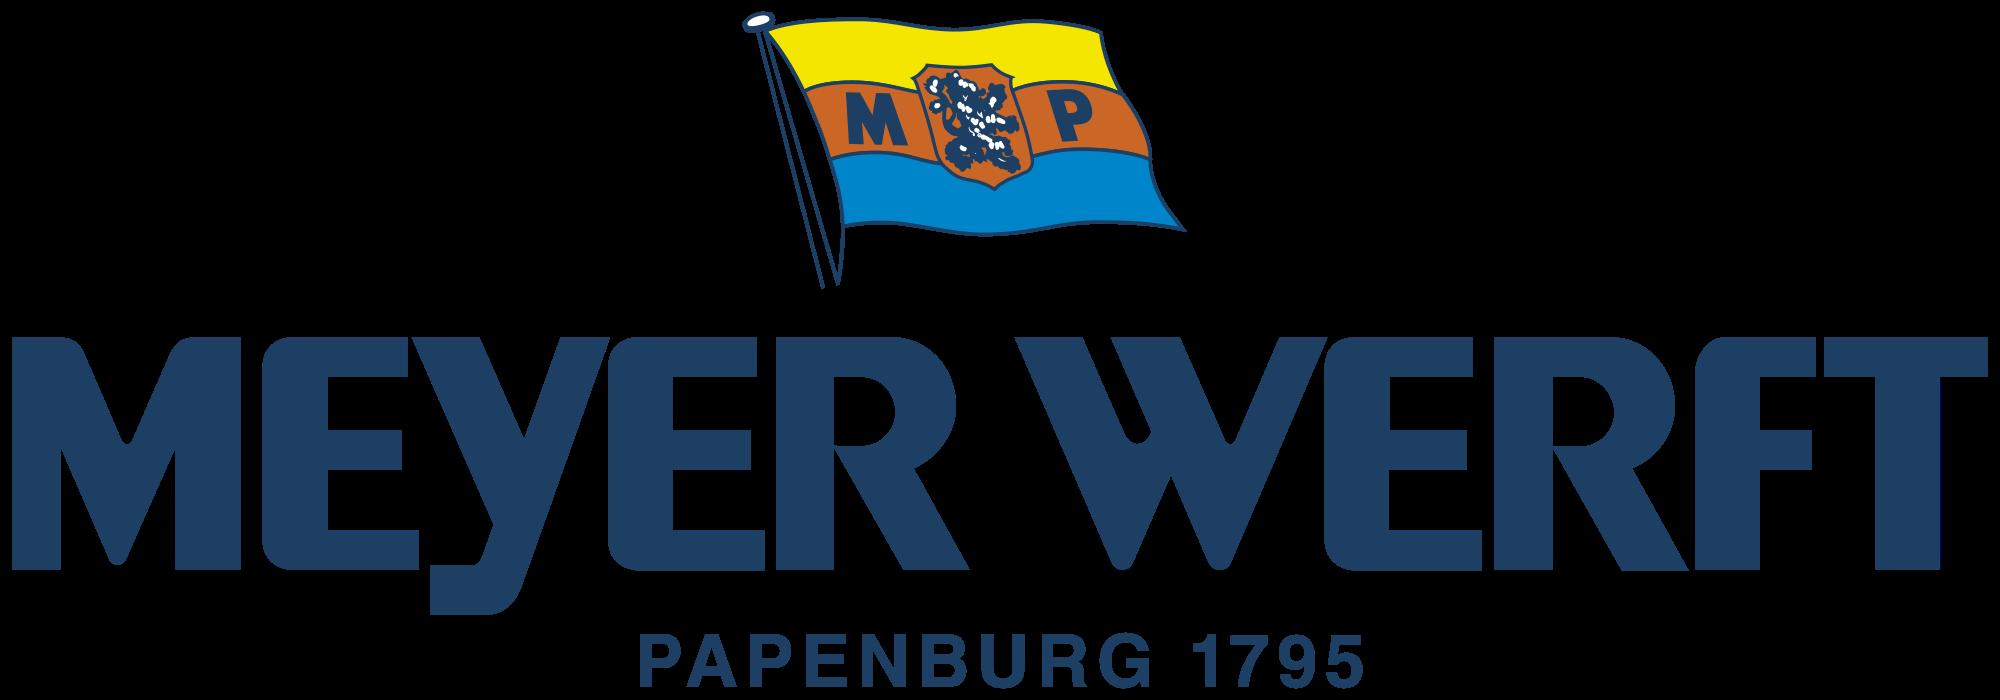 Meyer_Werft-Logo.png